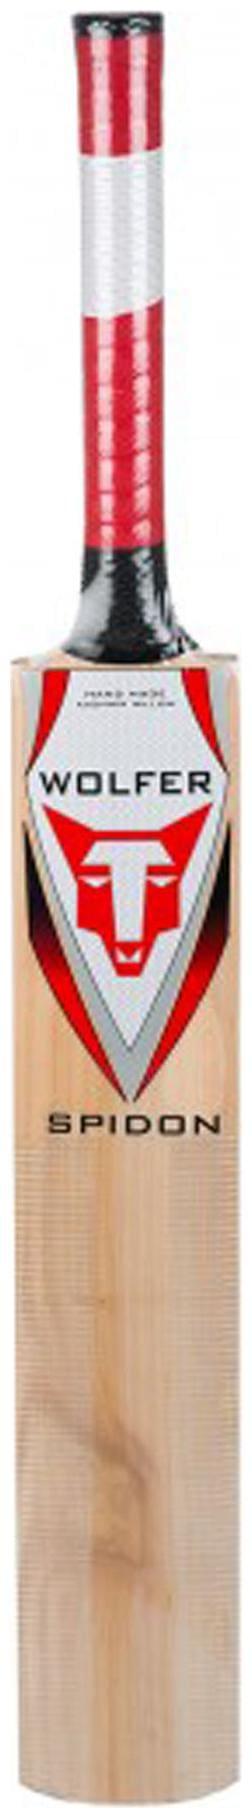 Wolfer Spidon Kashmir Willow Cricket Bat (Size-SH)